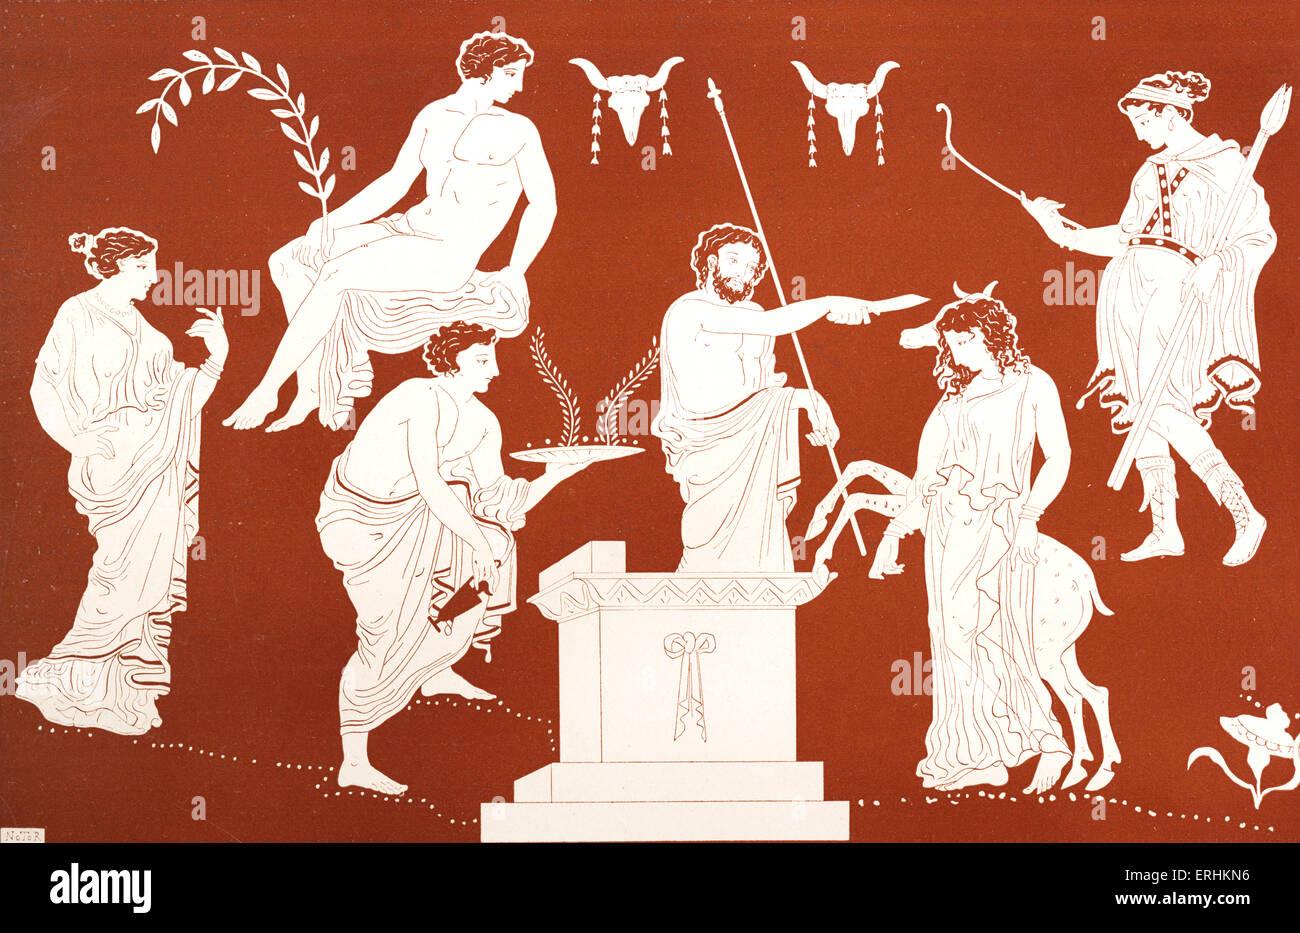 Iphigenia - the sacrifice of the daughter of Agamemnon and Clytemnestra. Greek mythology.  Iphigeneia. - Stock Image